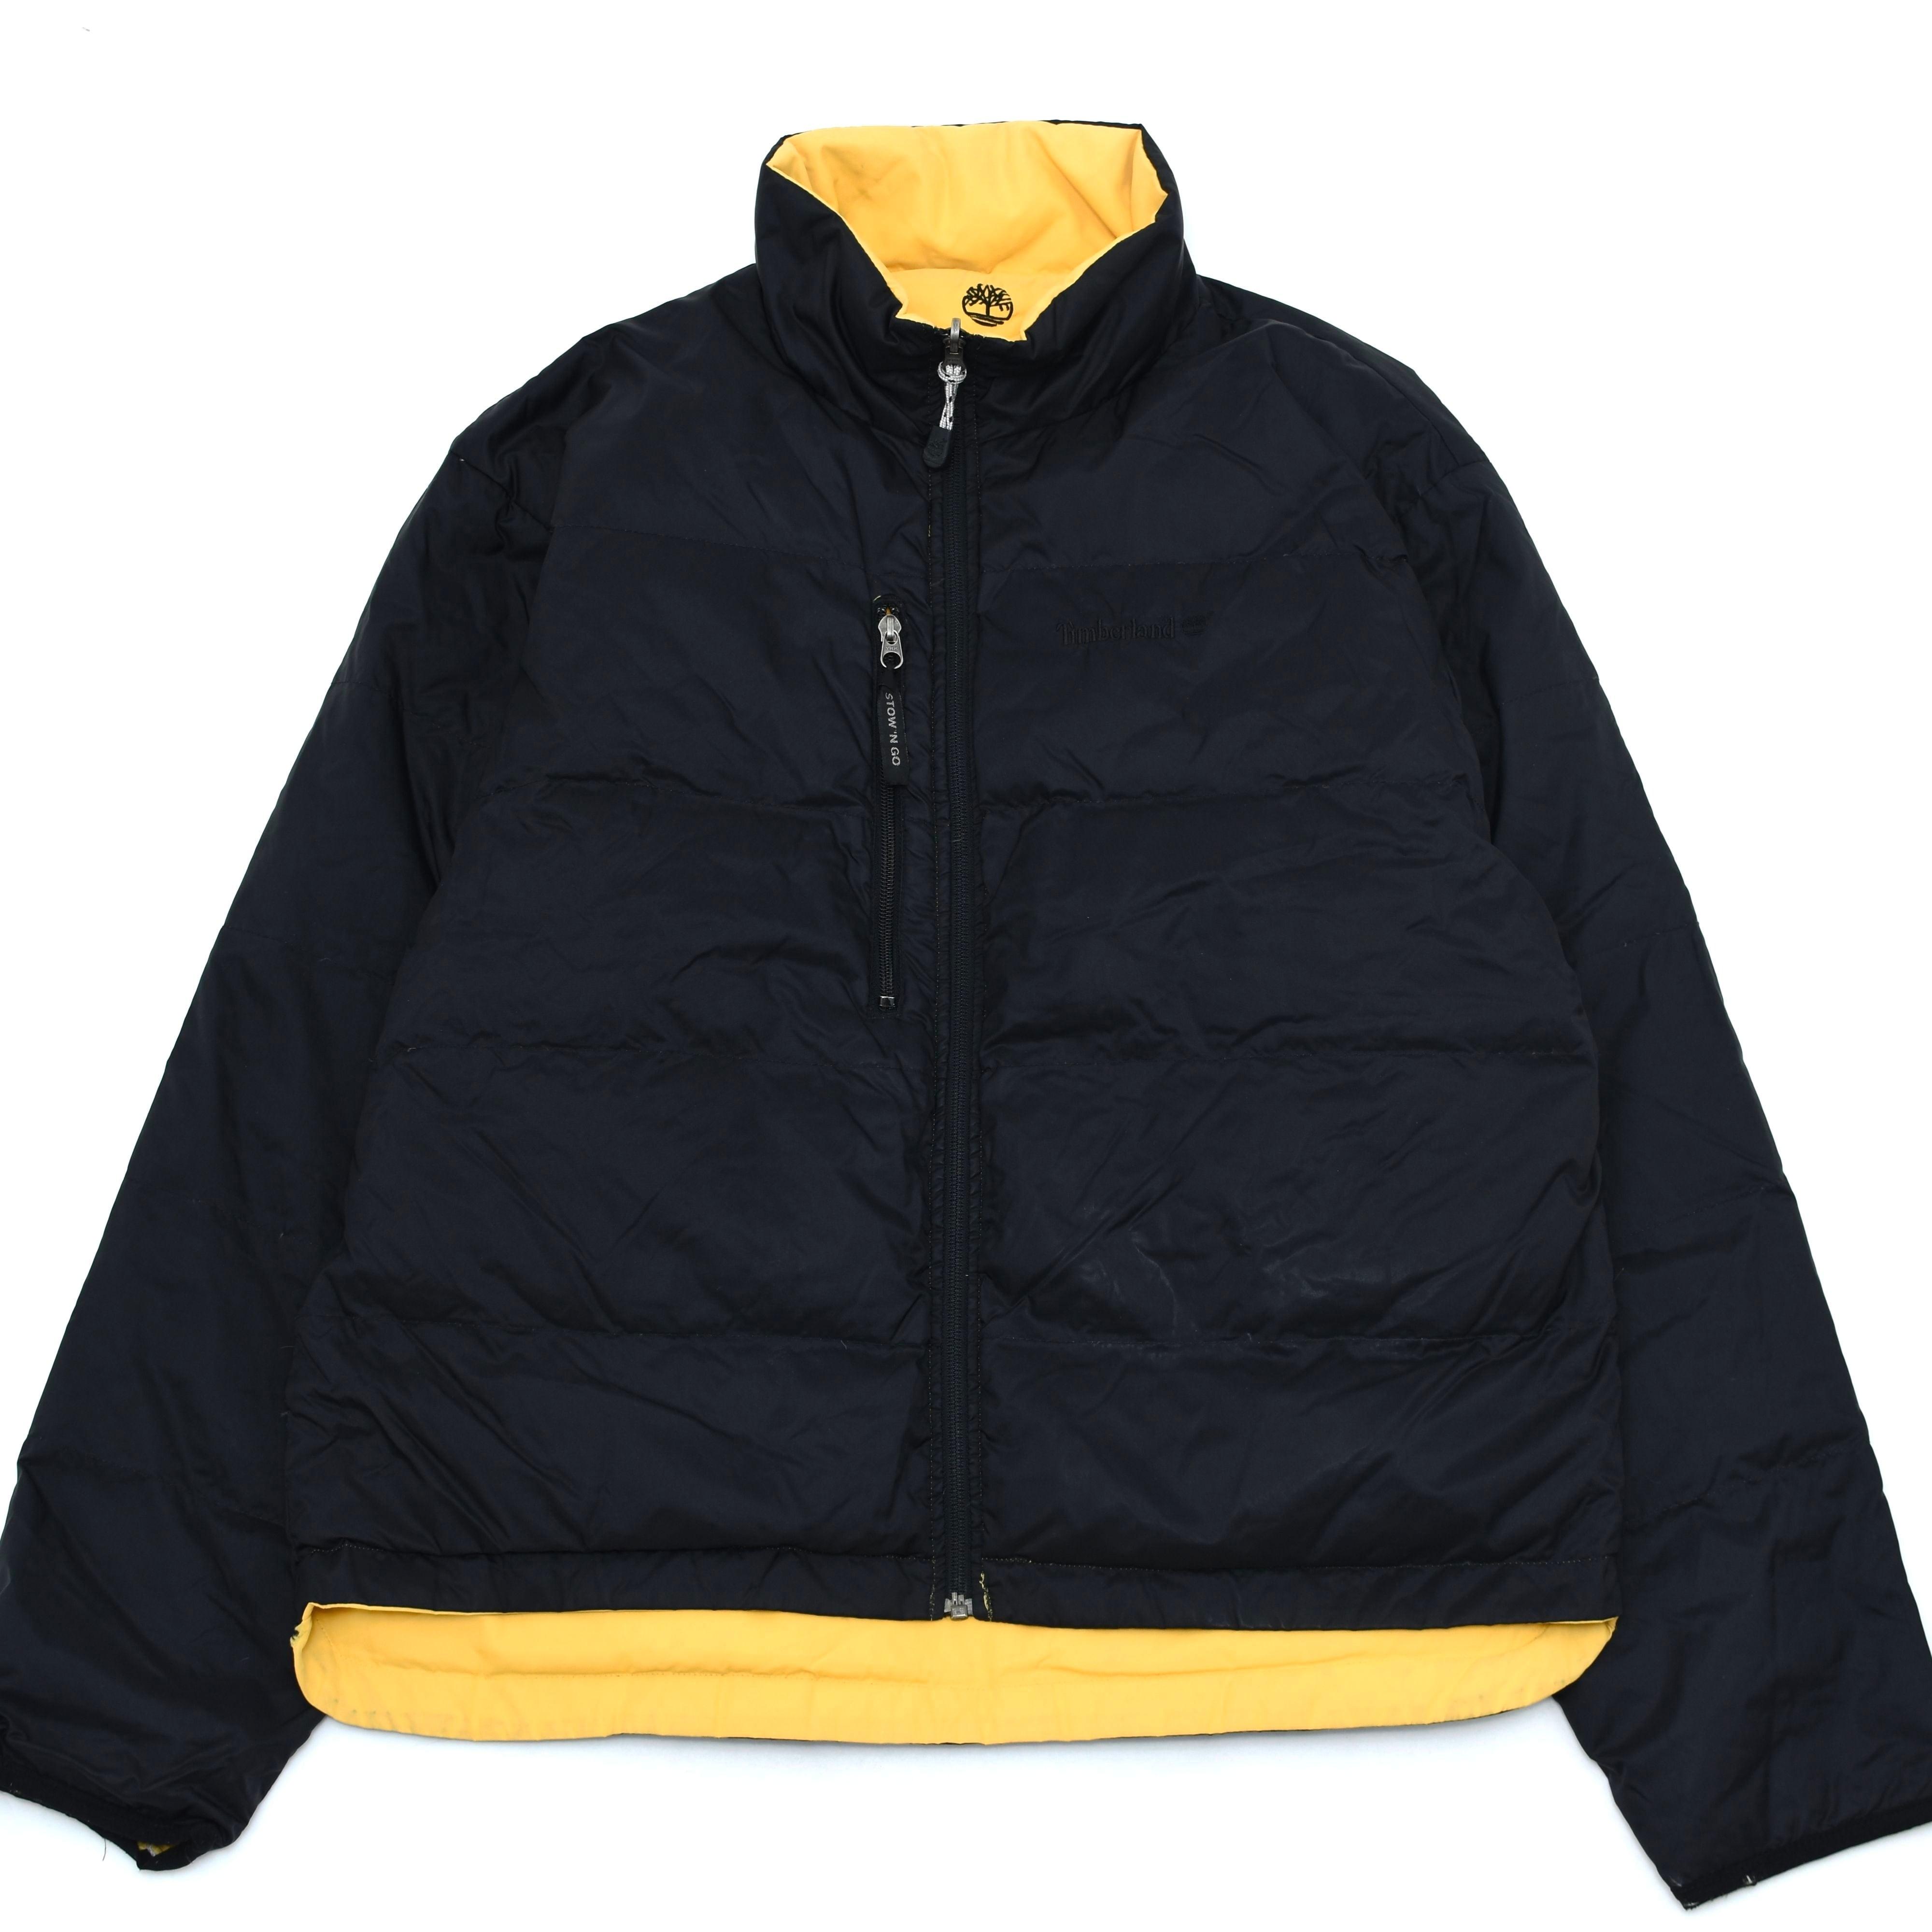 Timberland reversible down jacket